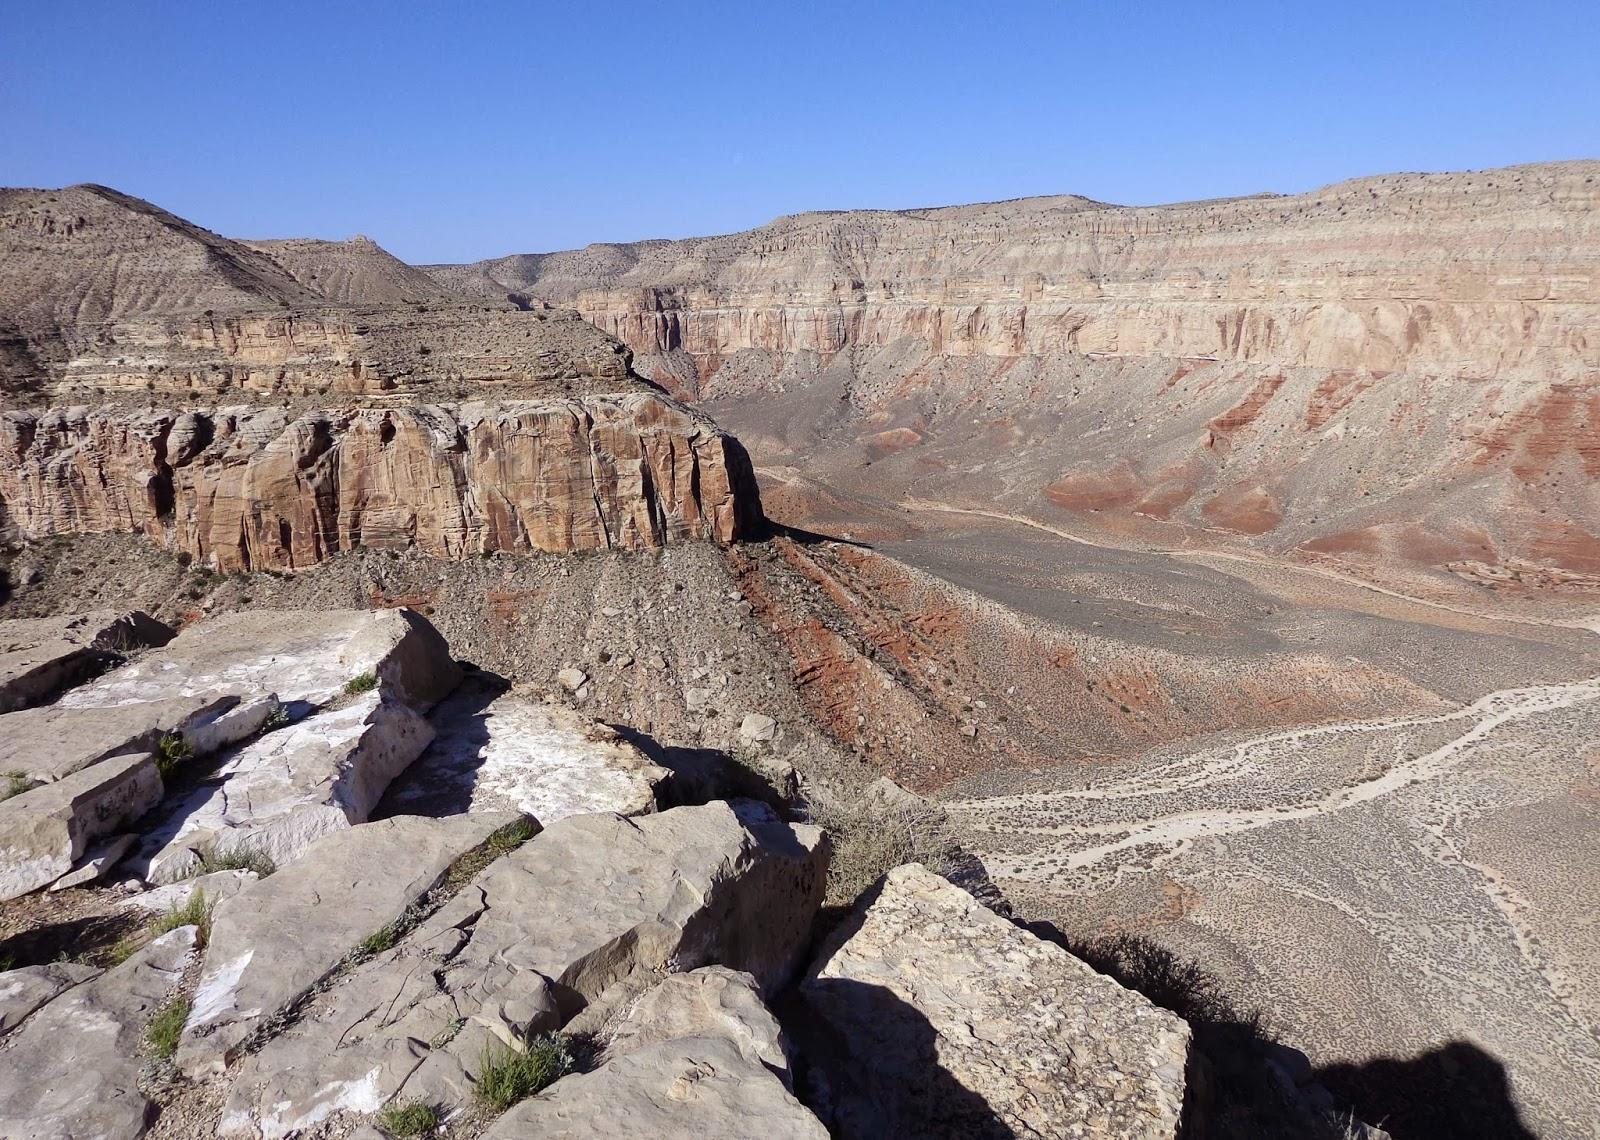 the great silence: hualapai hilltop (arizona series)